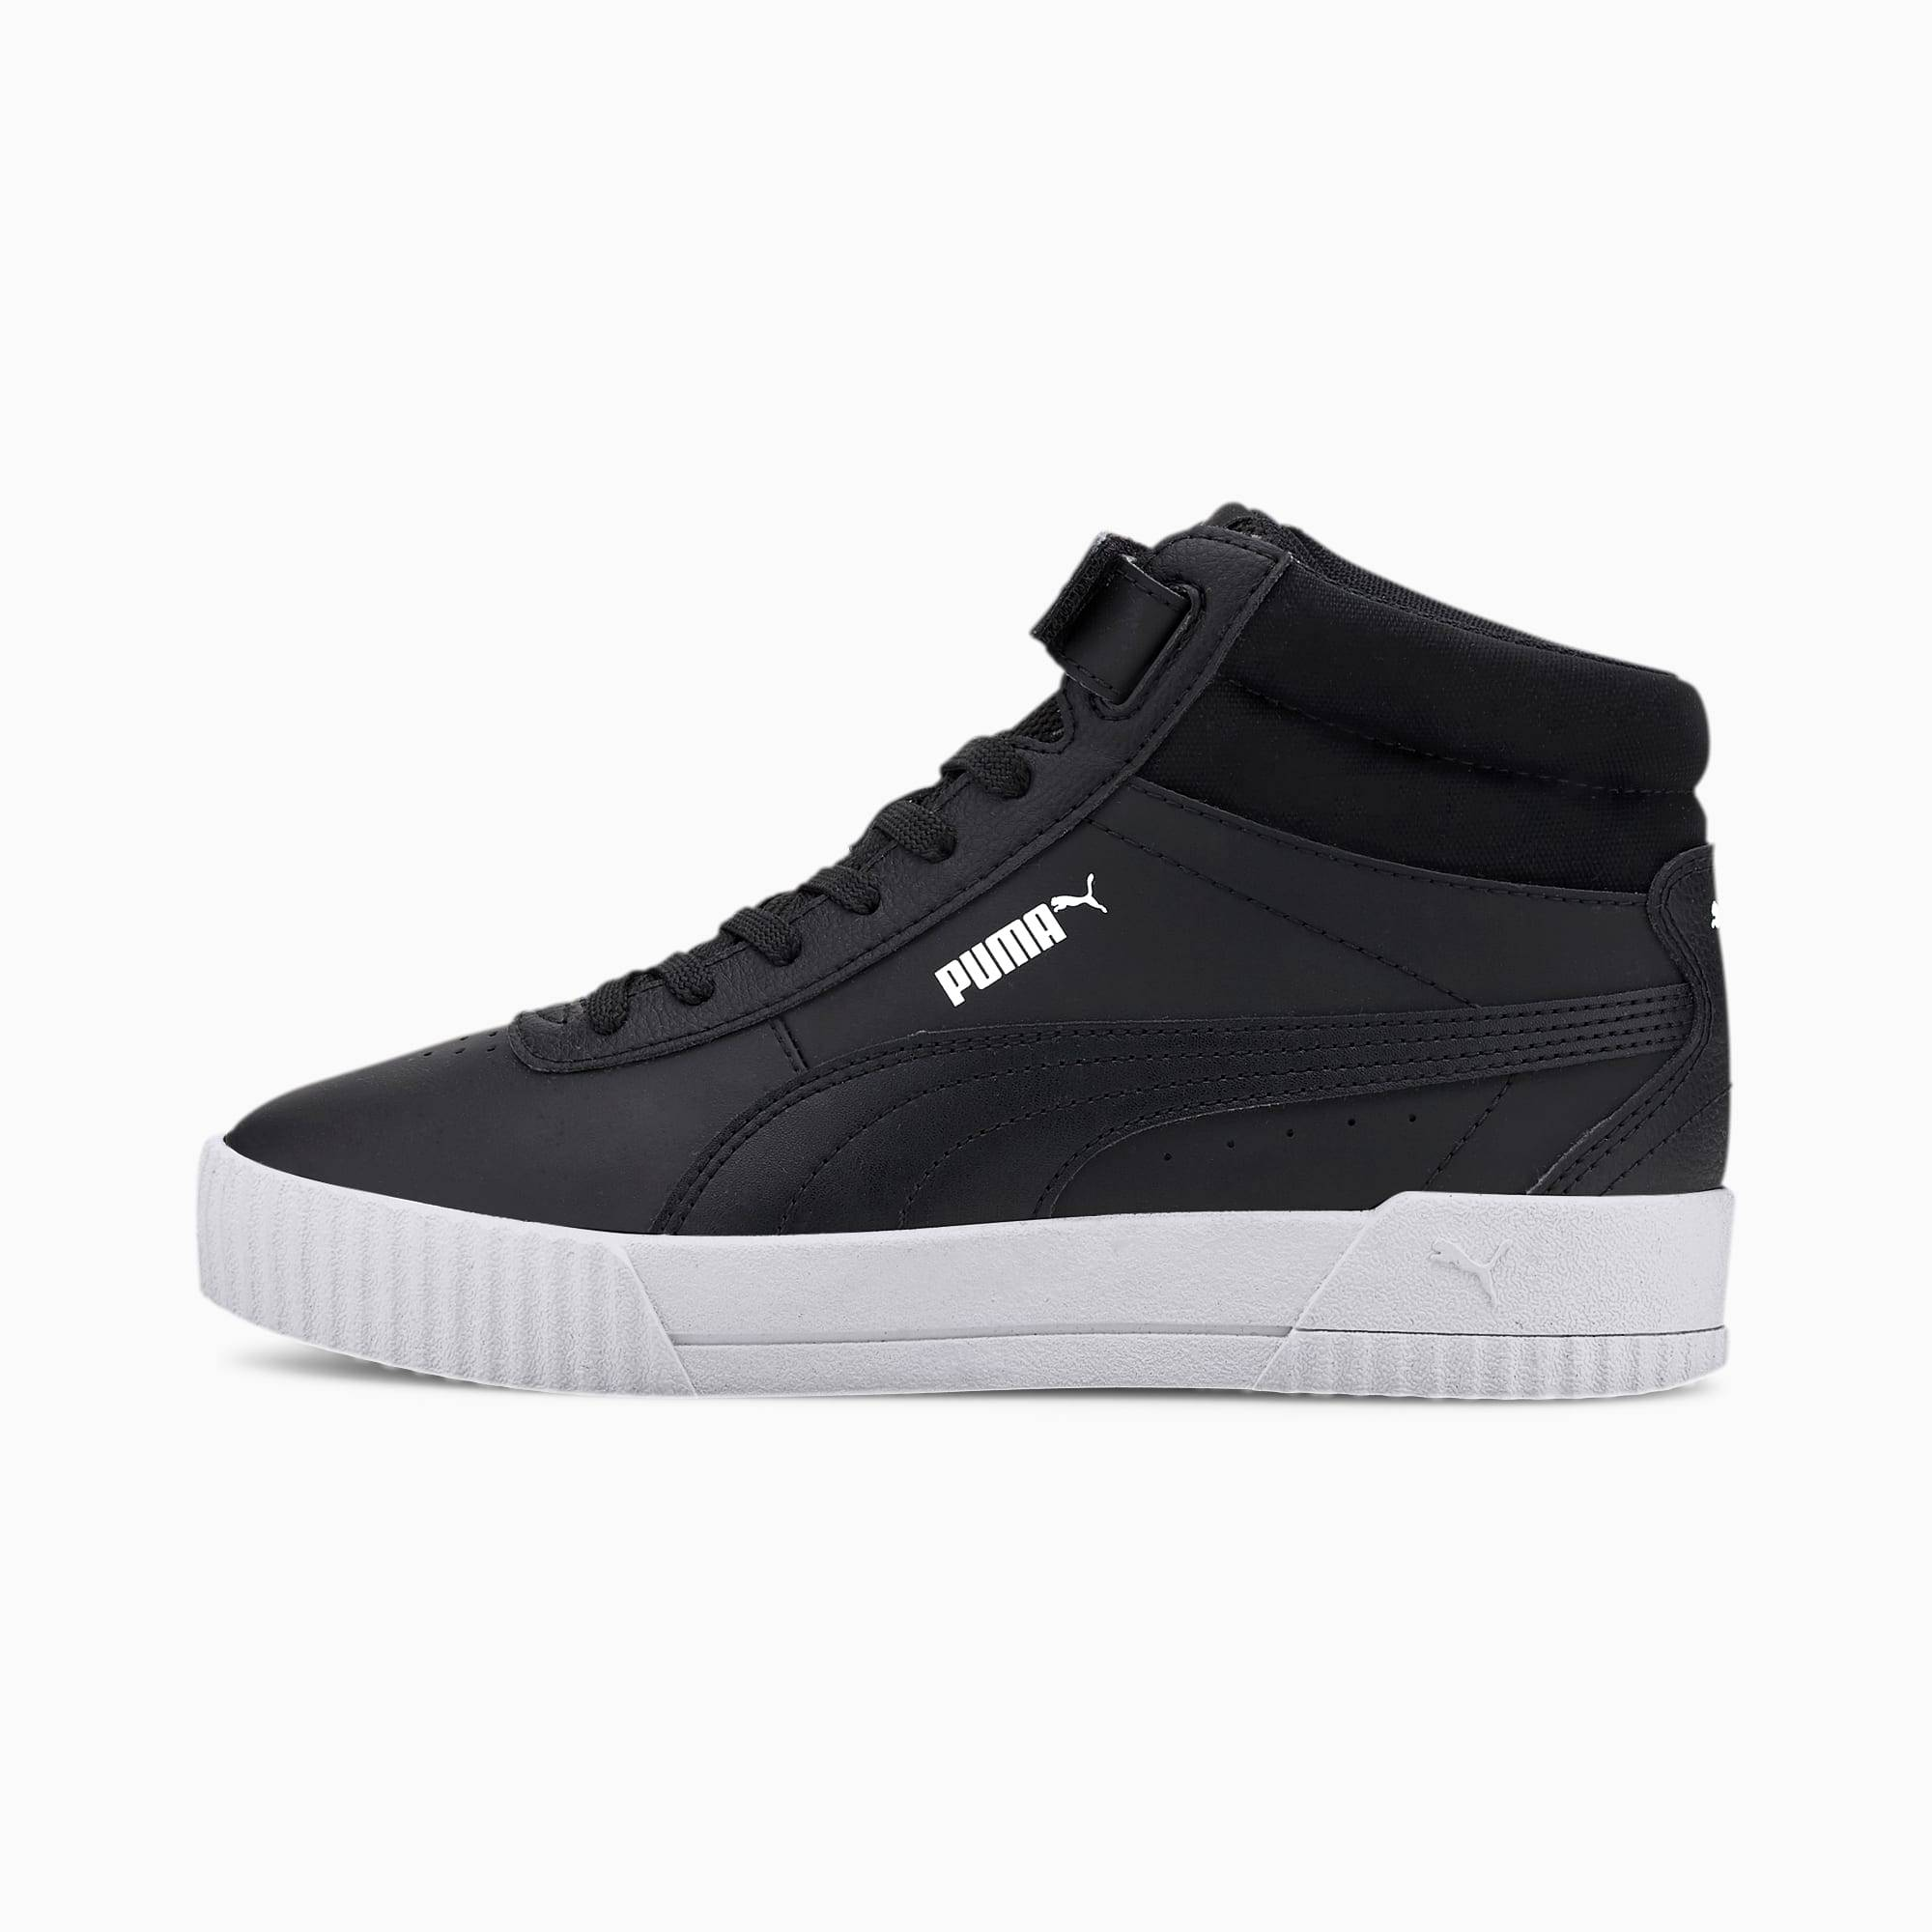 PUMA Chaussure Basket montante Carina femme, Noir, Taille 40.5, Chaussures